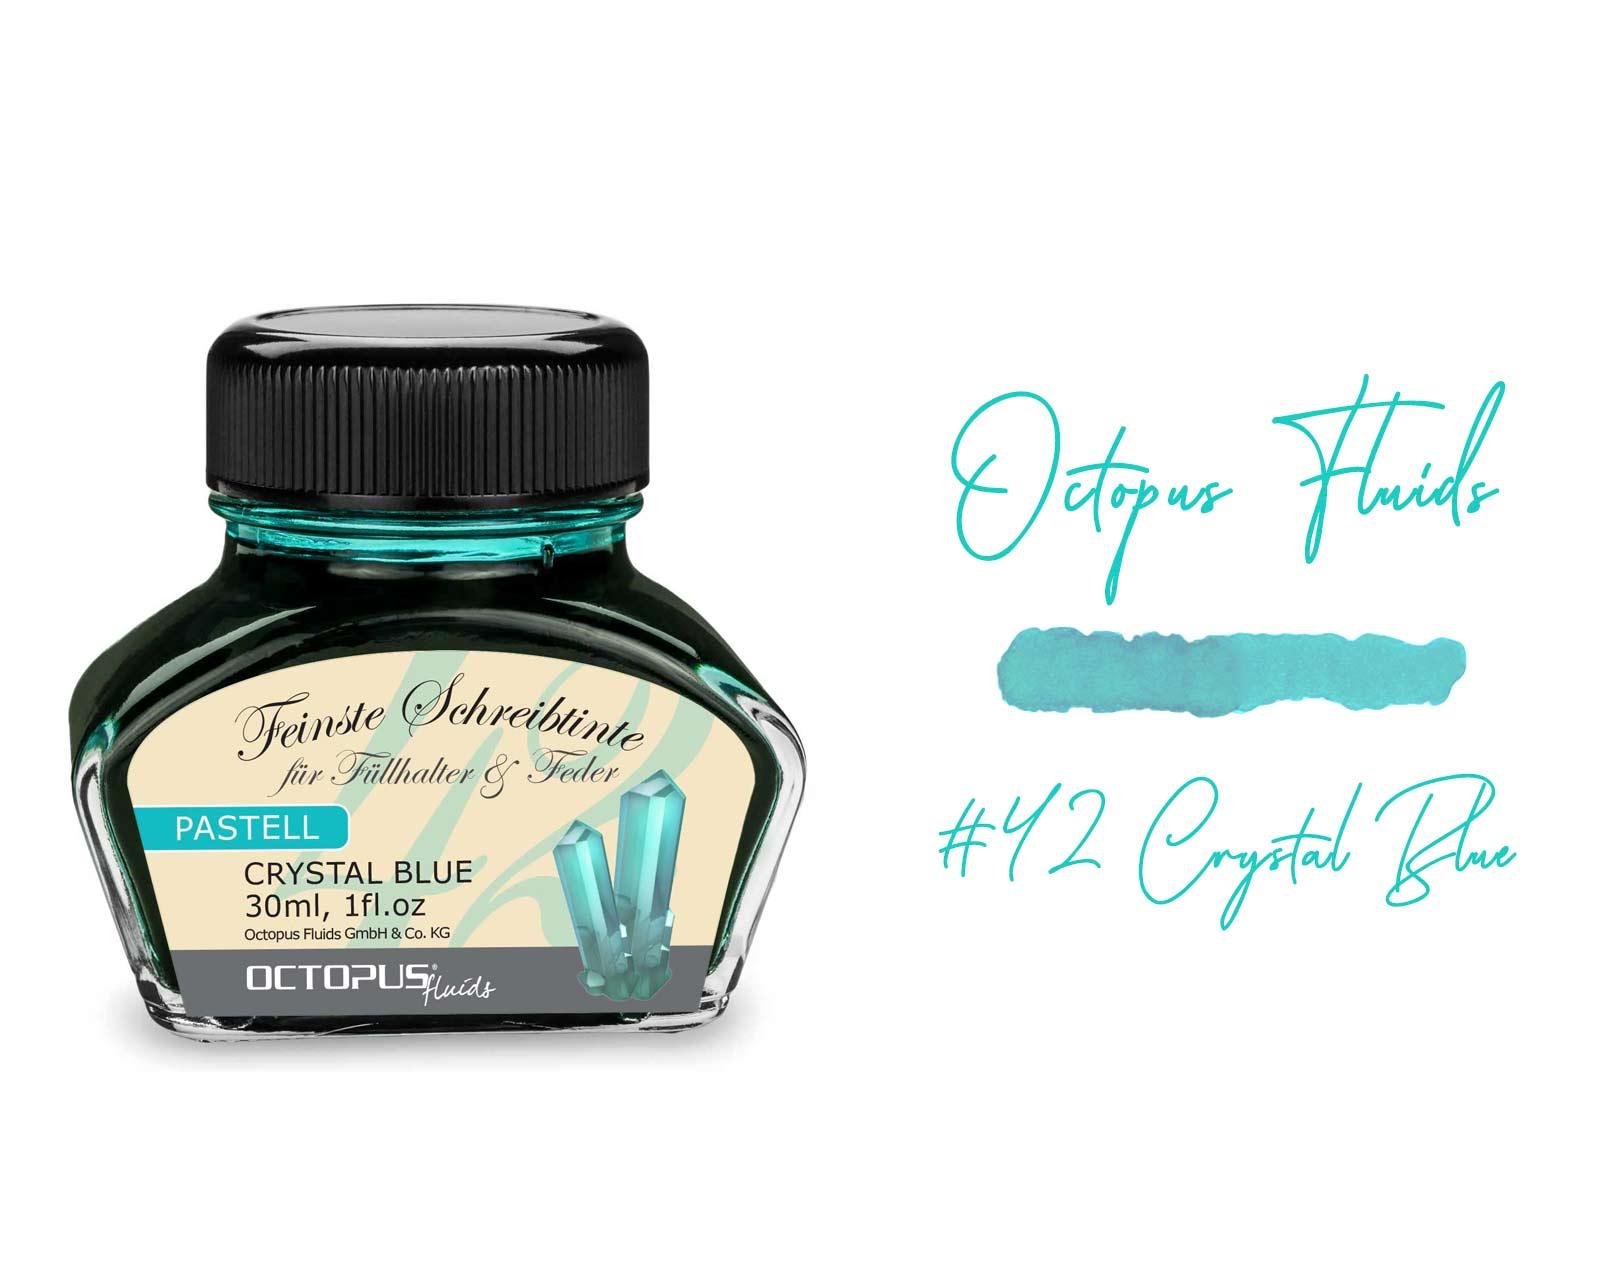 Octopus Fluids Pastell -Crystal Blue 30ml